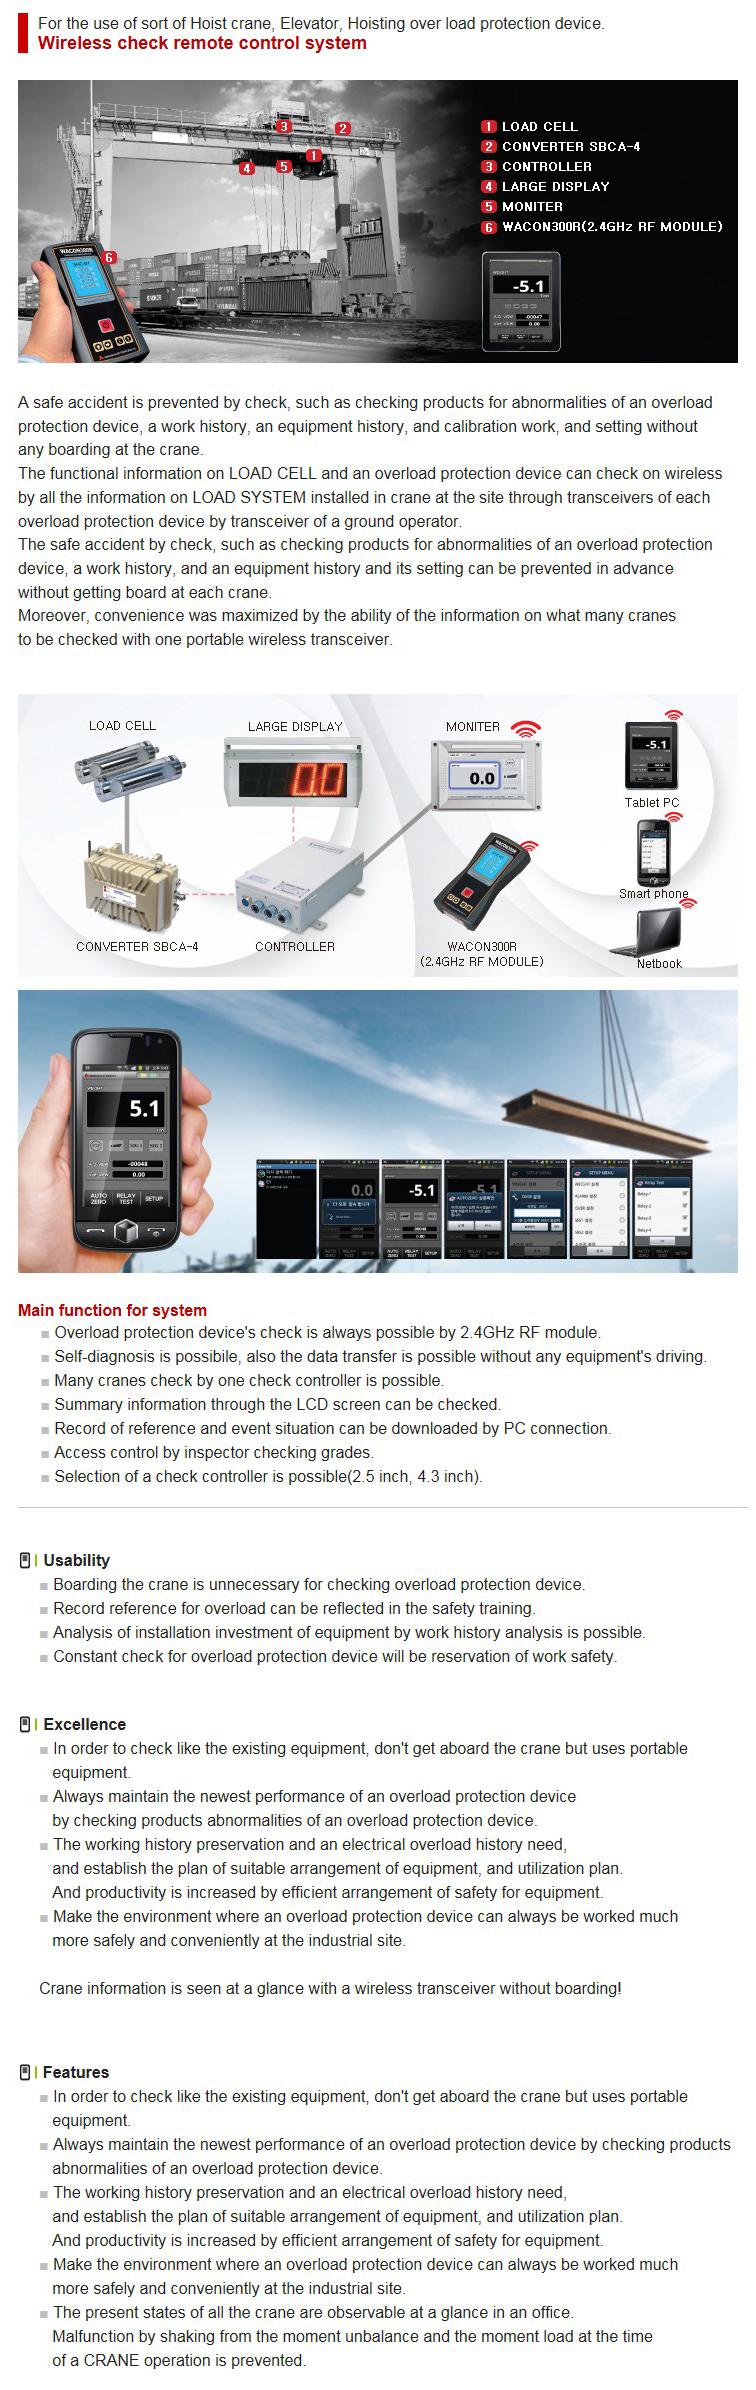 SHINHAN ELECTRIONICS Wireless Check Remote Control System